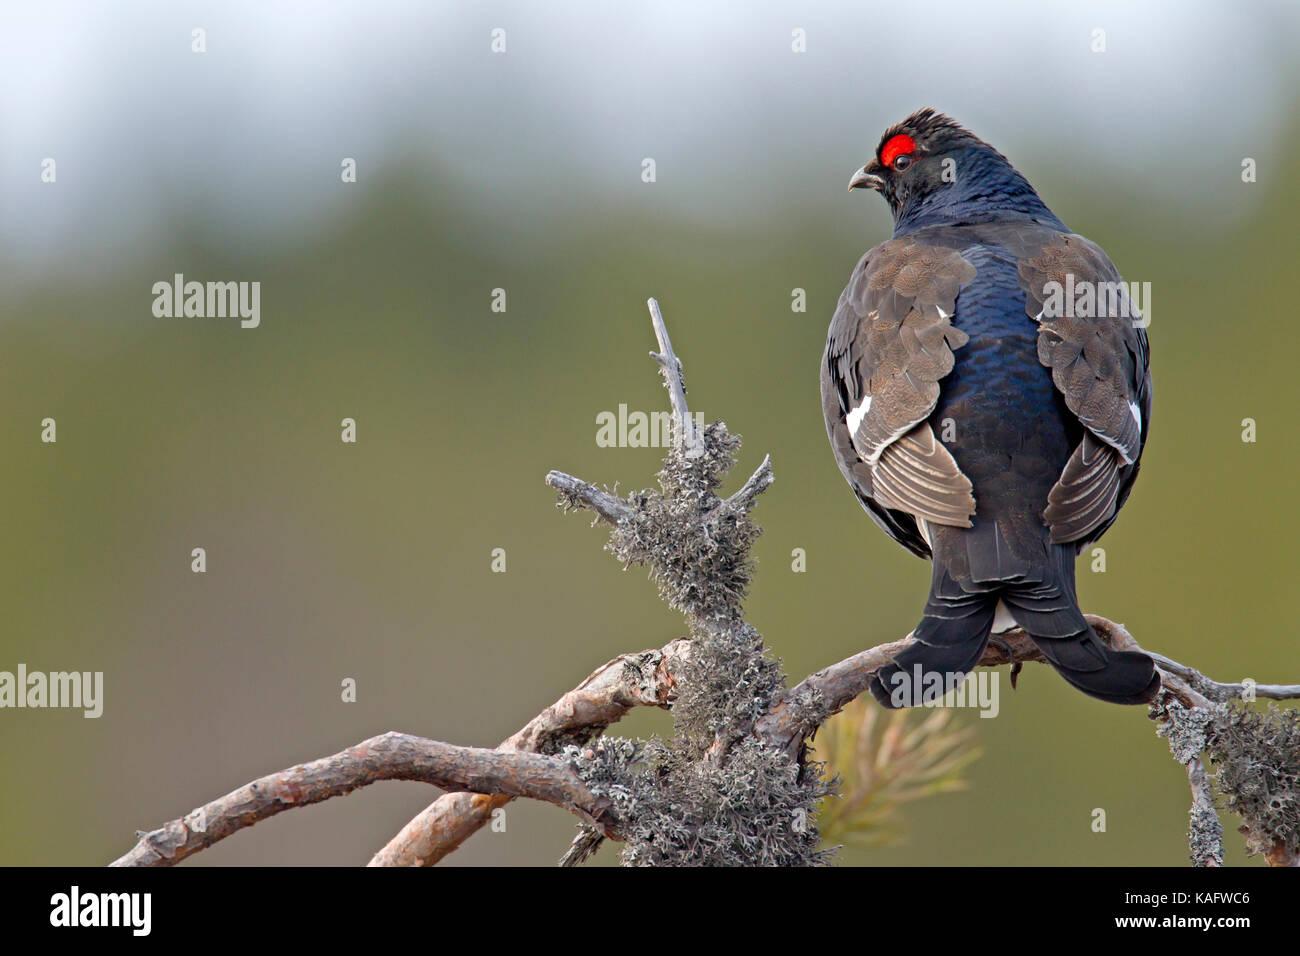 Black Grouse (Tetrao tetrix, Lyrurus tetrix) Blackcock perched on the branch of a pine - Stock Image